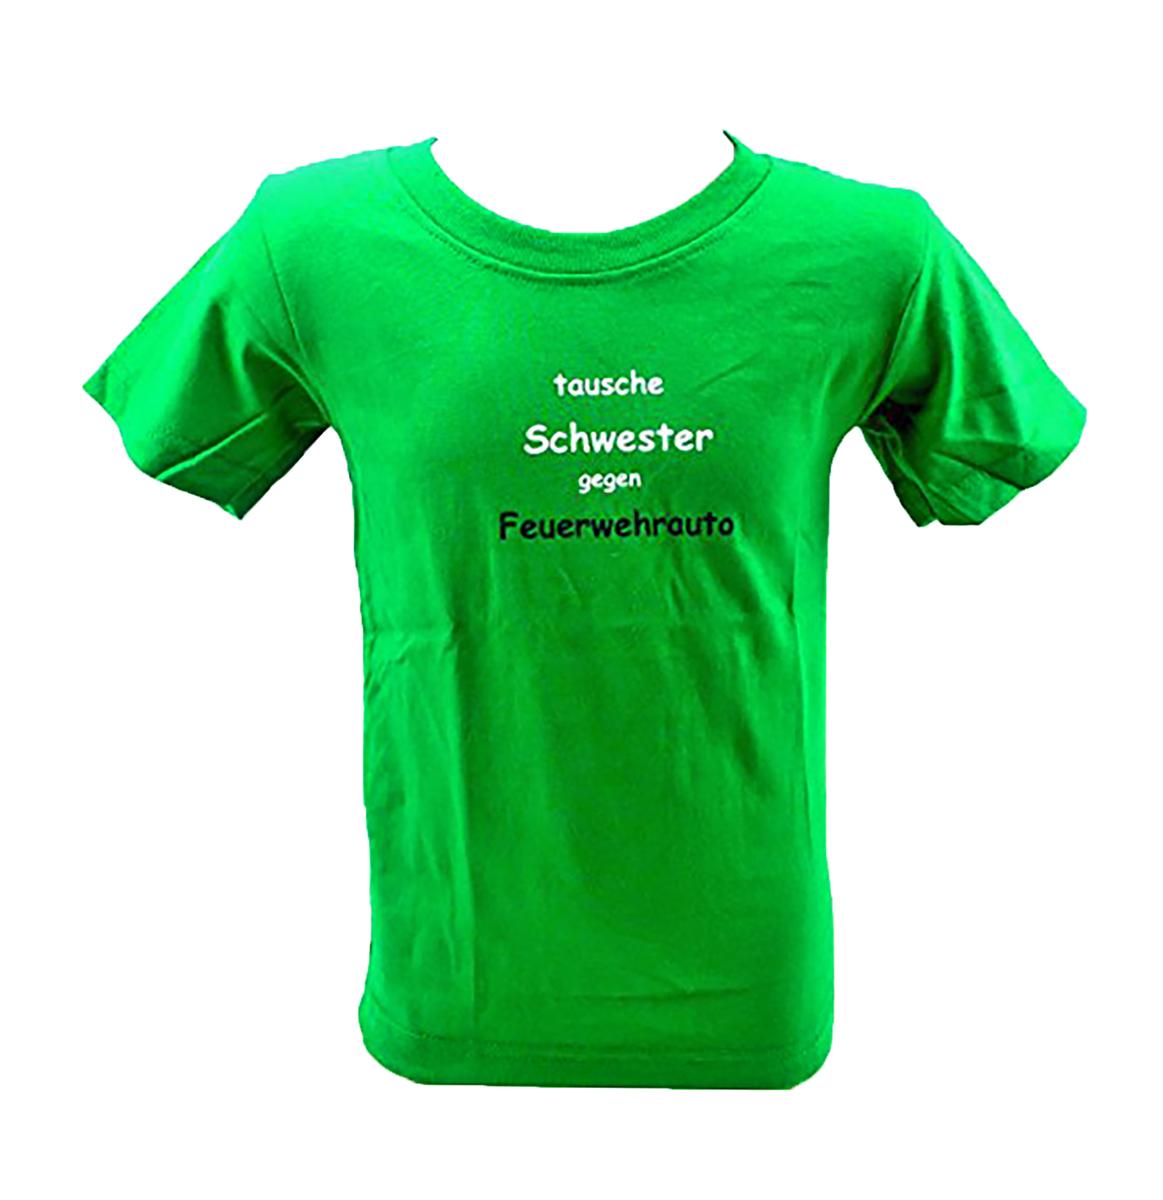 Full Size of Lustige Sprüche T Shirt Männer Sprüche T Shirt Englisch Bayerische Sprüche T Shirt Lustige Sprüche T Shirt Damen Küche Sprüche T Shirt